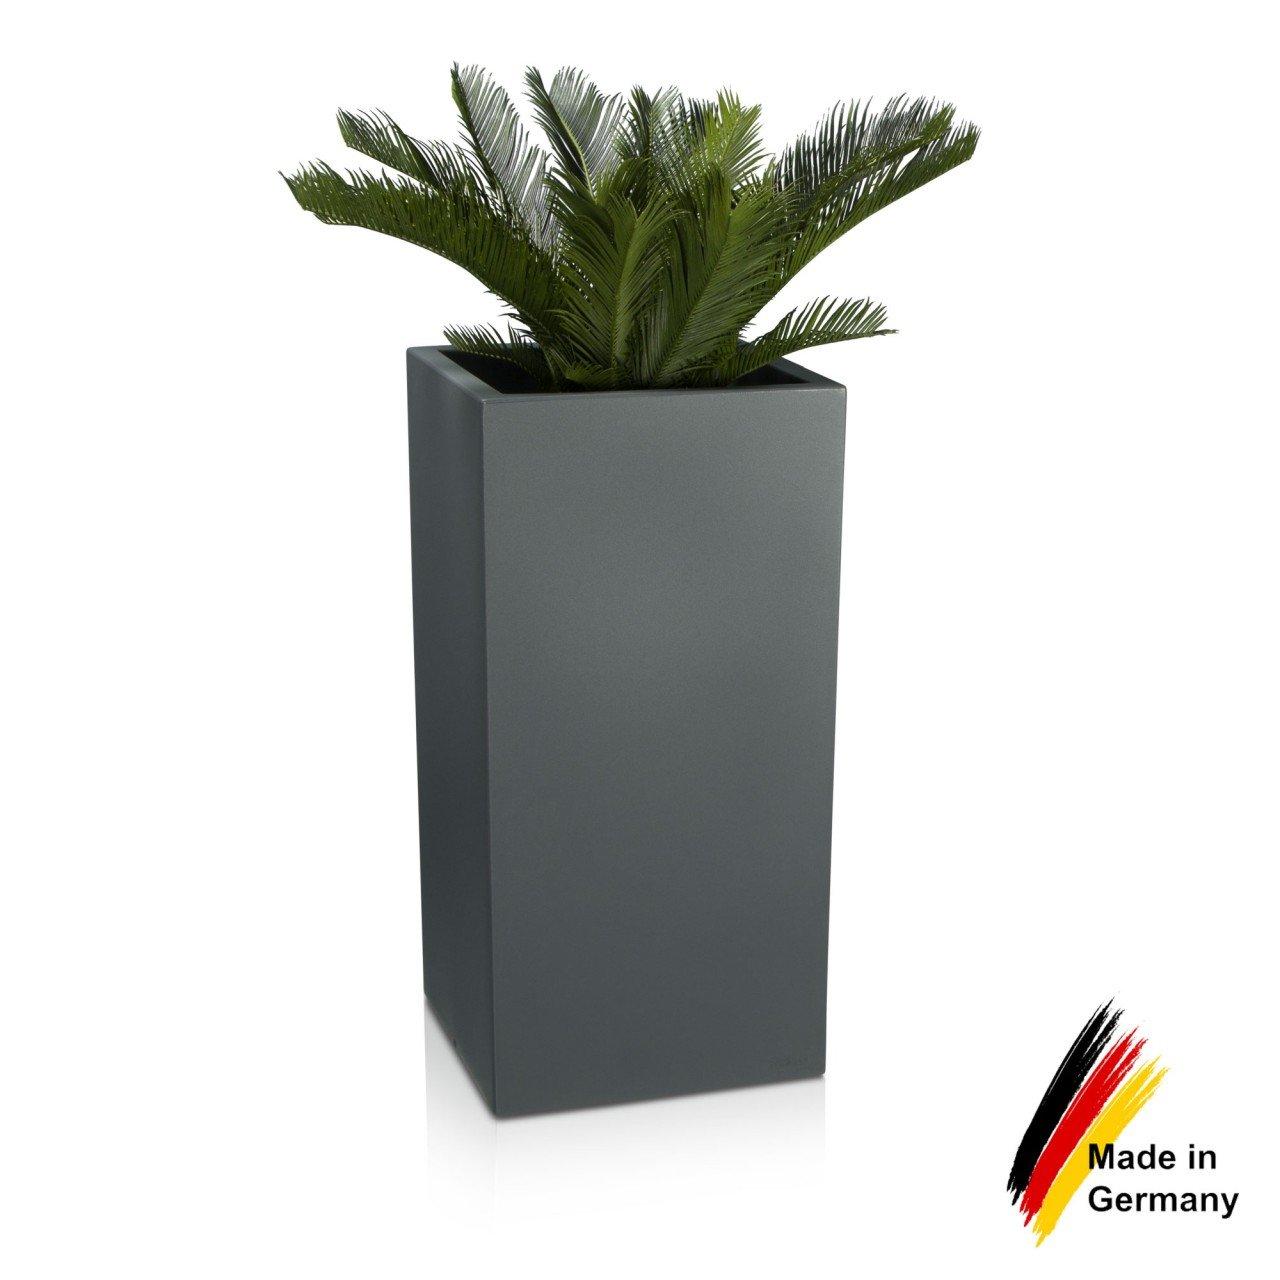 Pflanzkübel TORRE 80 Kunststoff Pflanzgefäß Blumenkübel, 40x40x80 cm ...